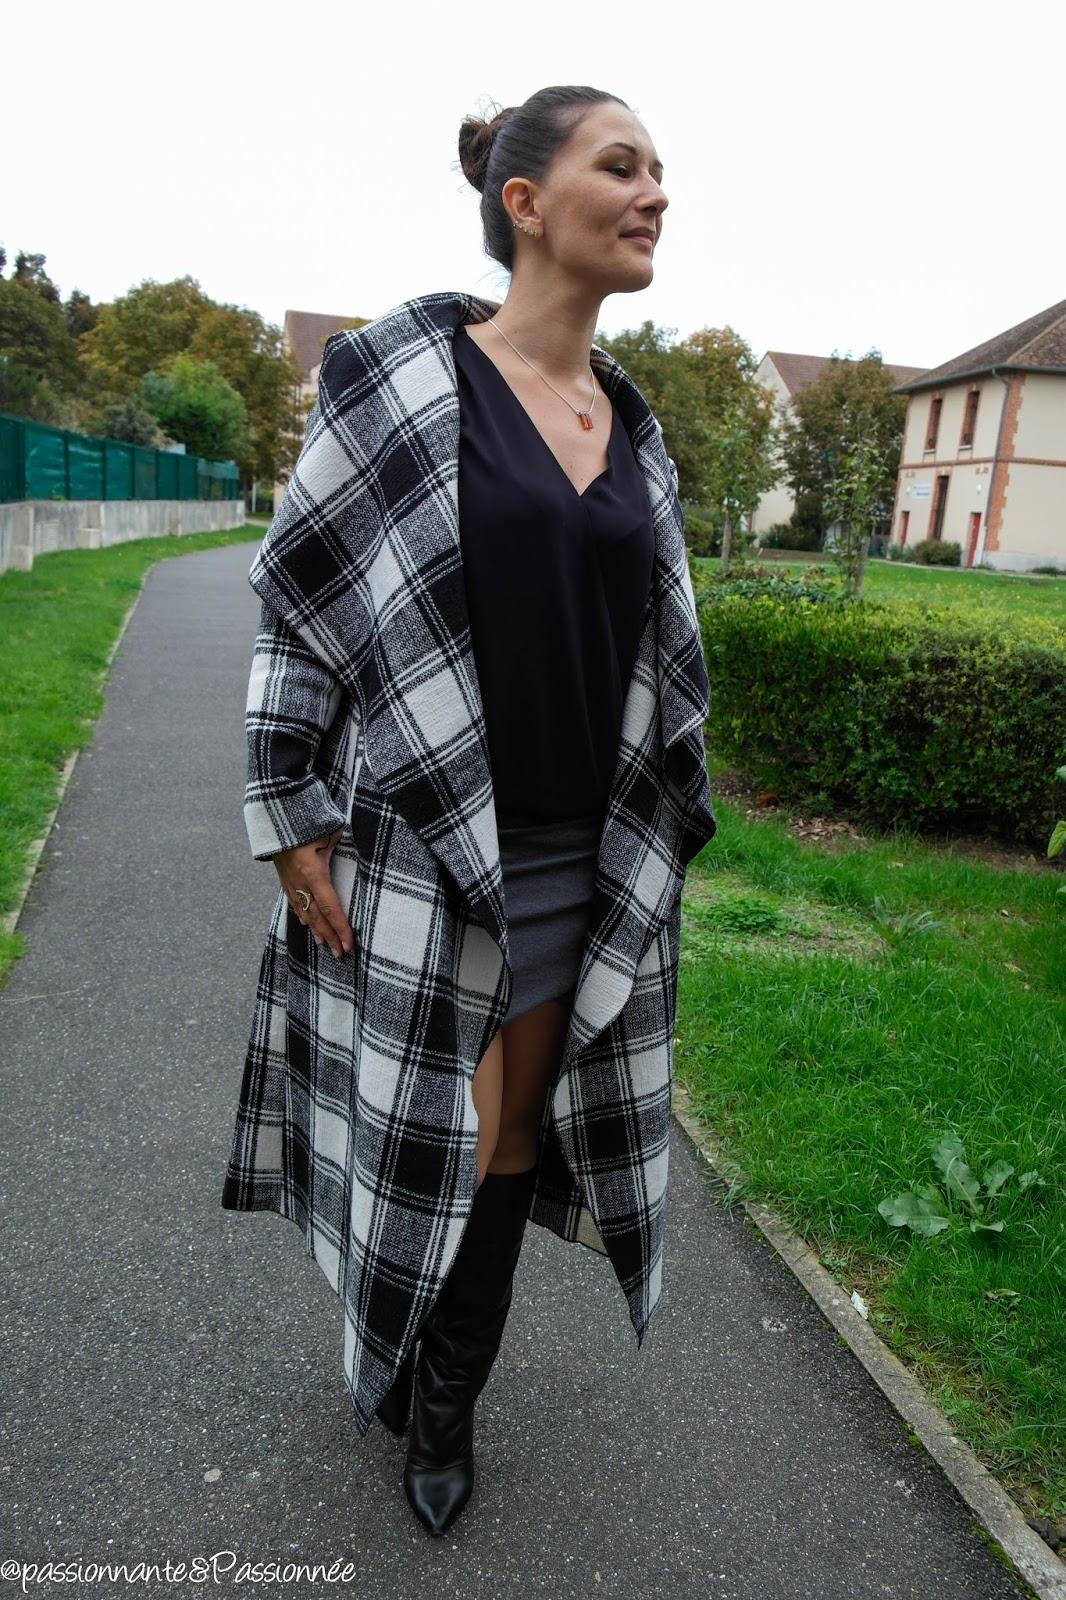 La pose blogueuse